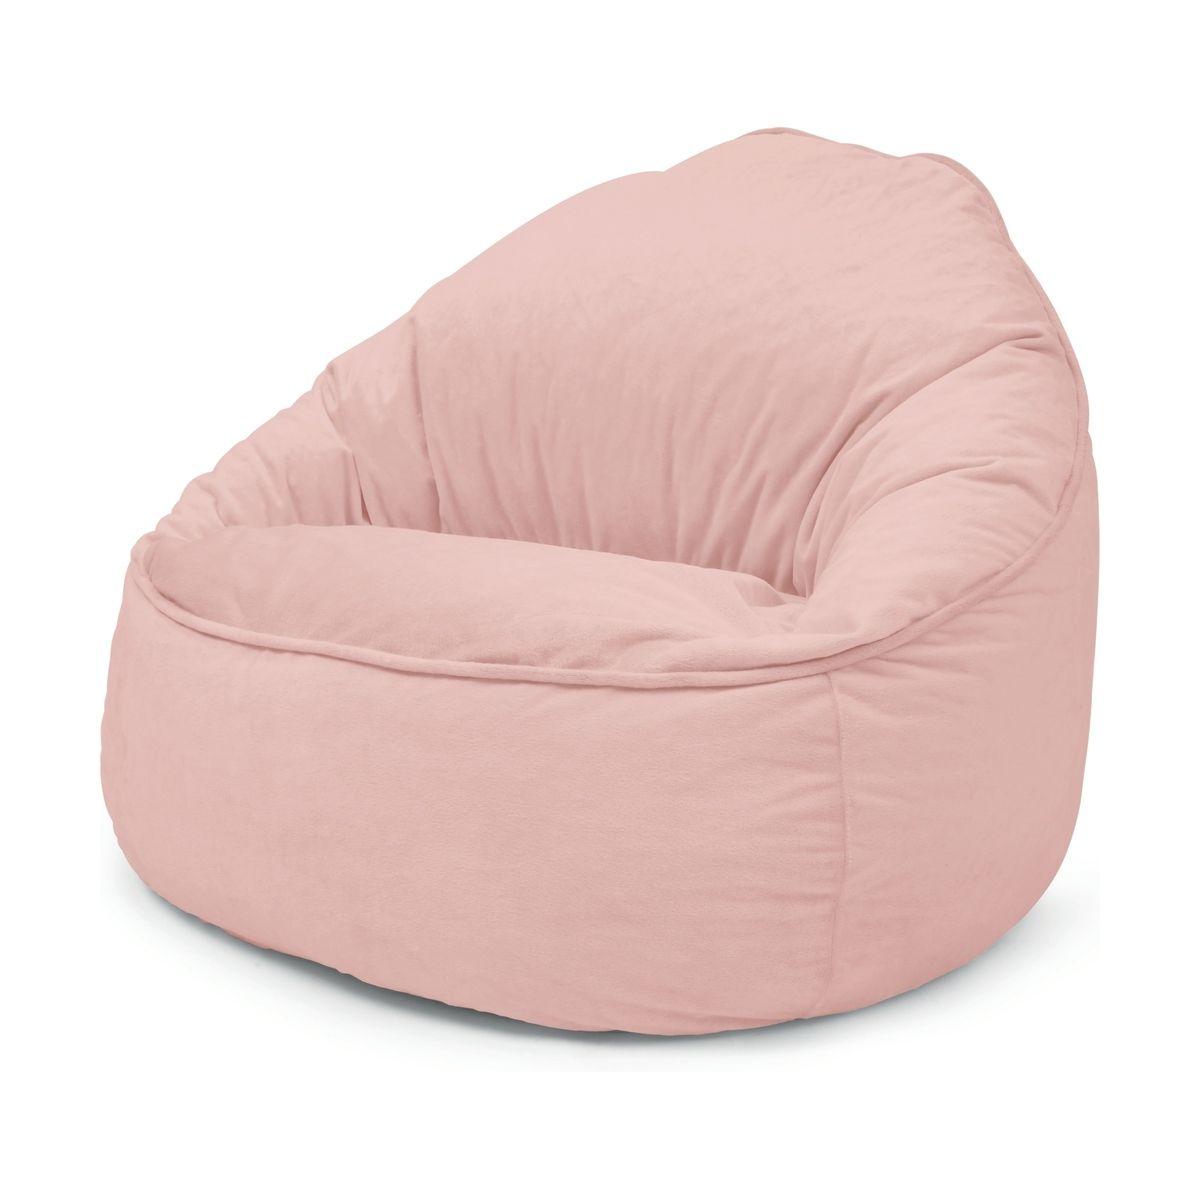 Kids Chair Bean Bag Pink In 2020 Pink Bean Bag Girls